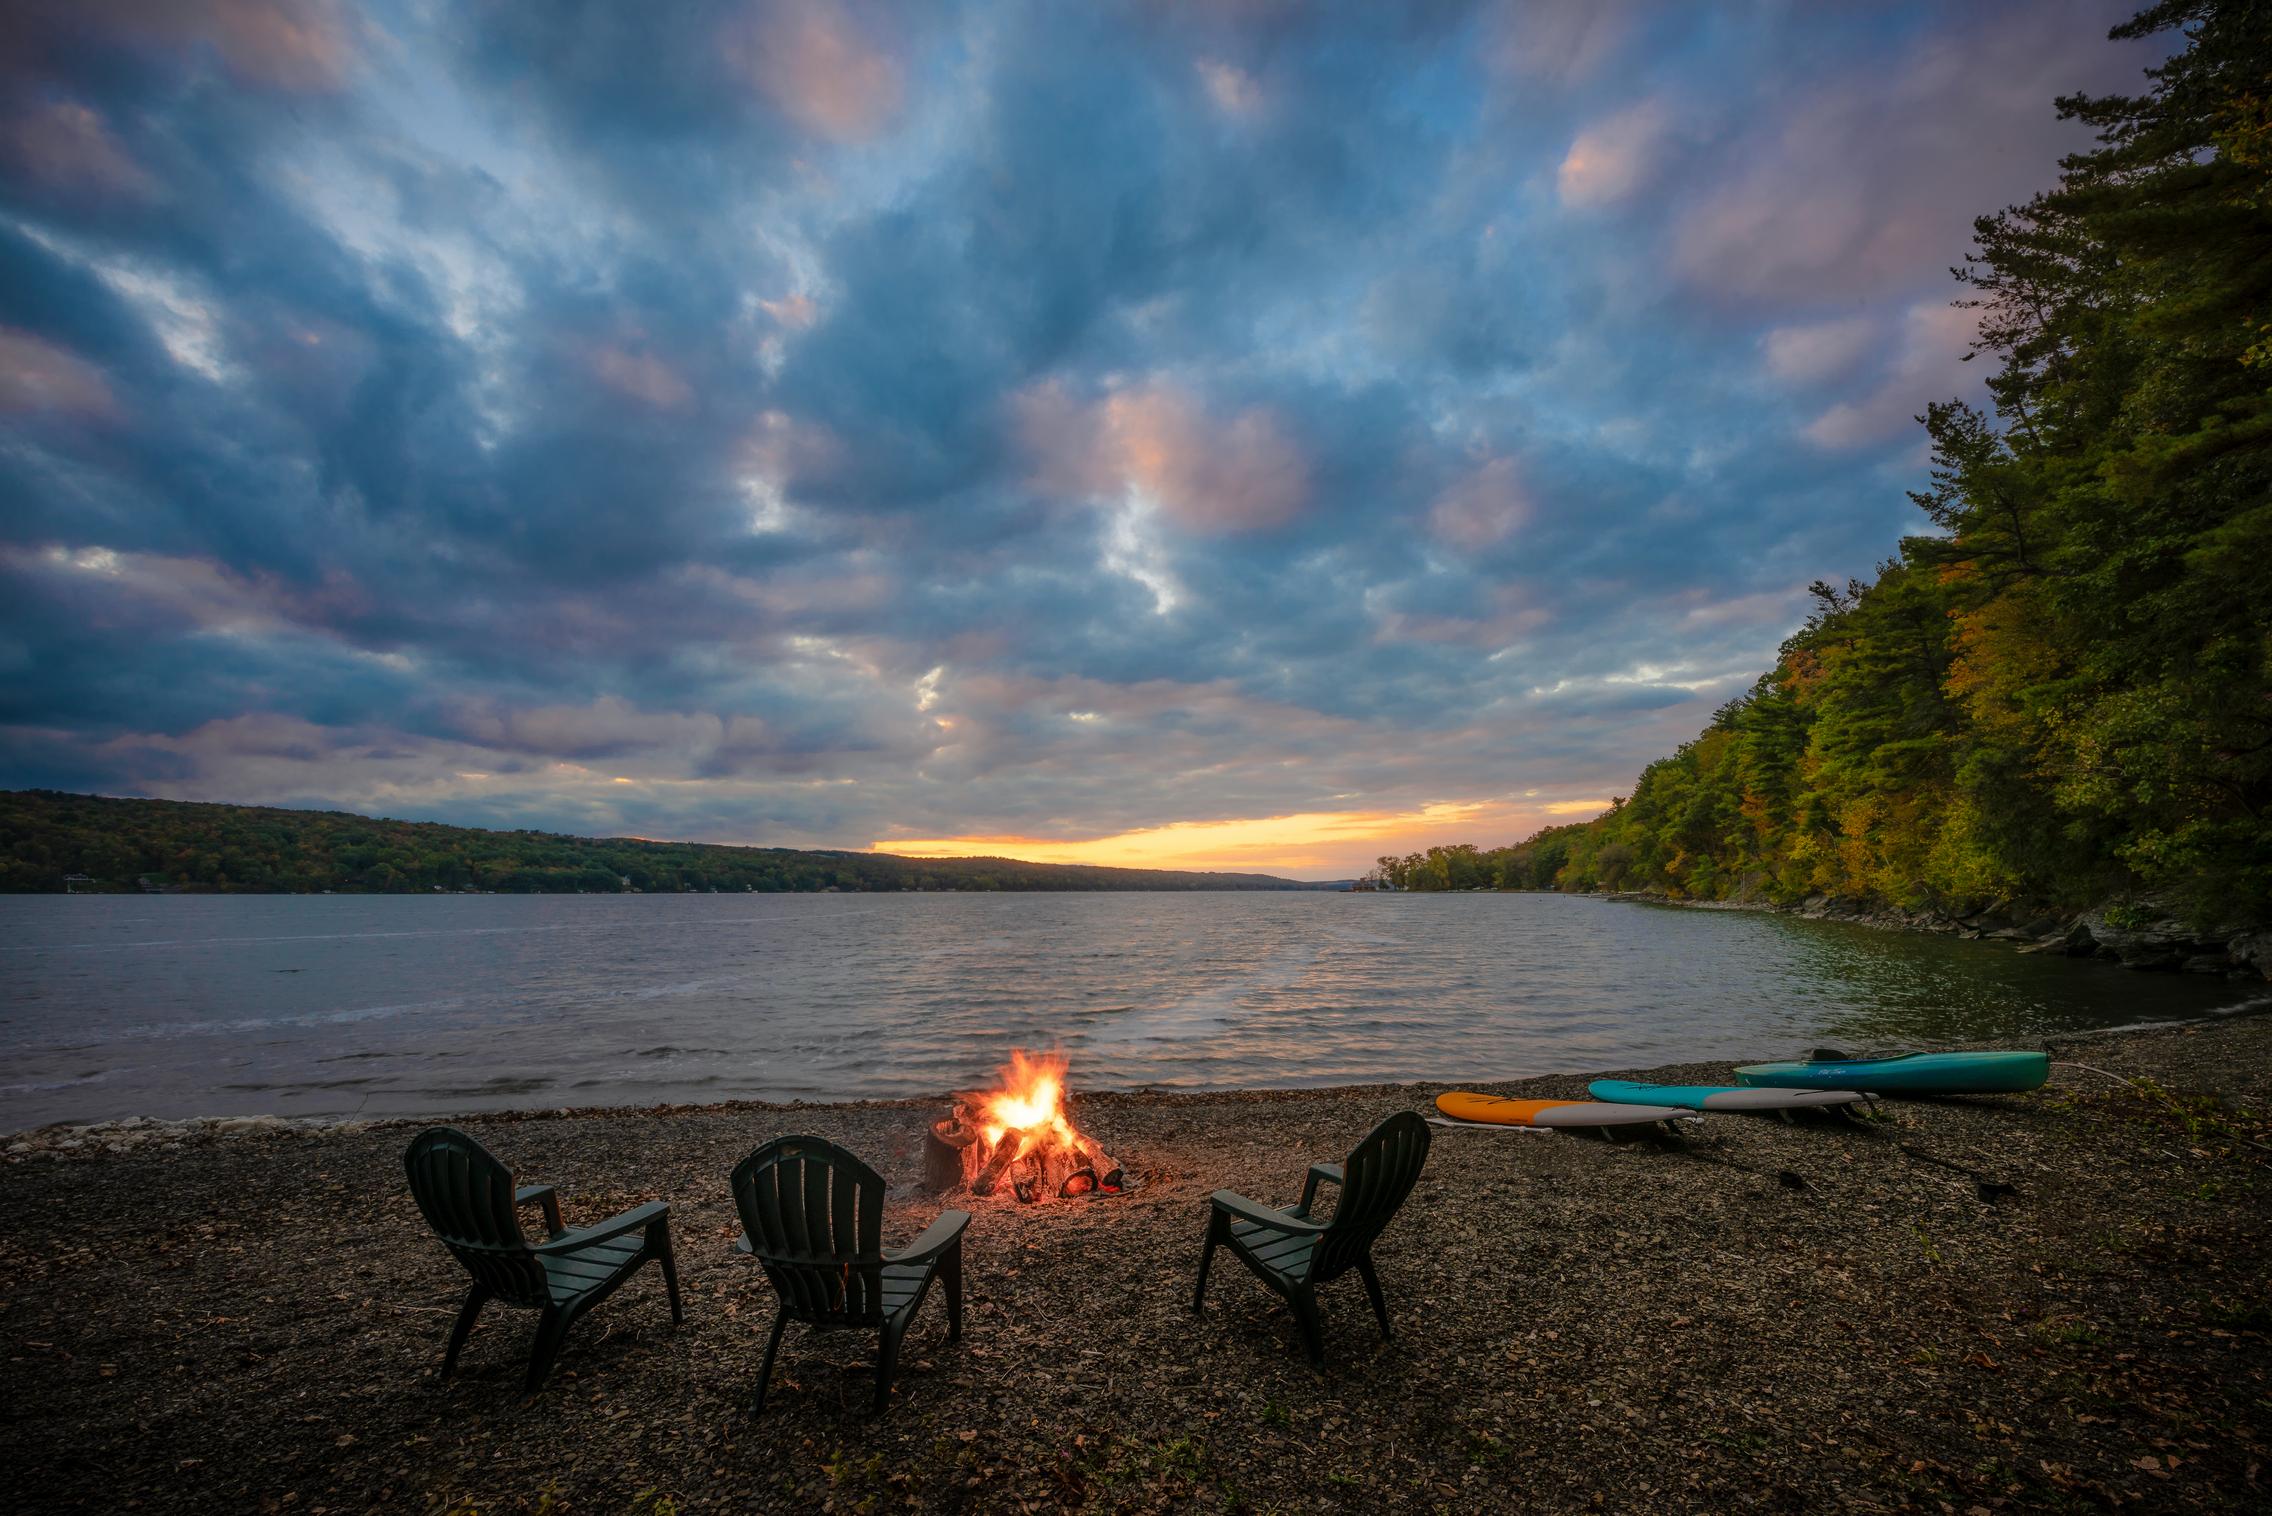 31 Camp Longhorn, 974 Ten Mile Point, Skaneateles, NY 13152, For Sale Michael DeRosa listings.JPG